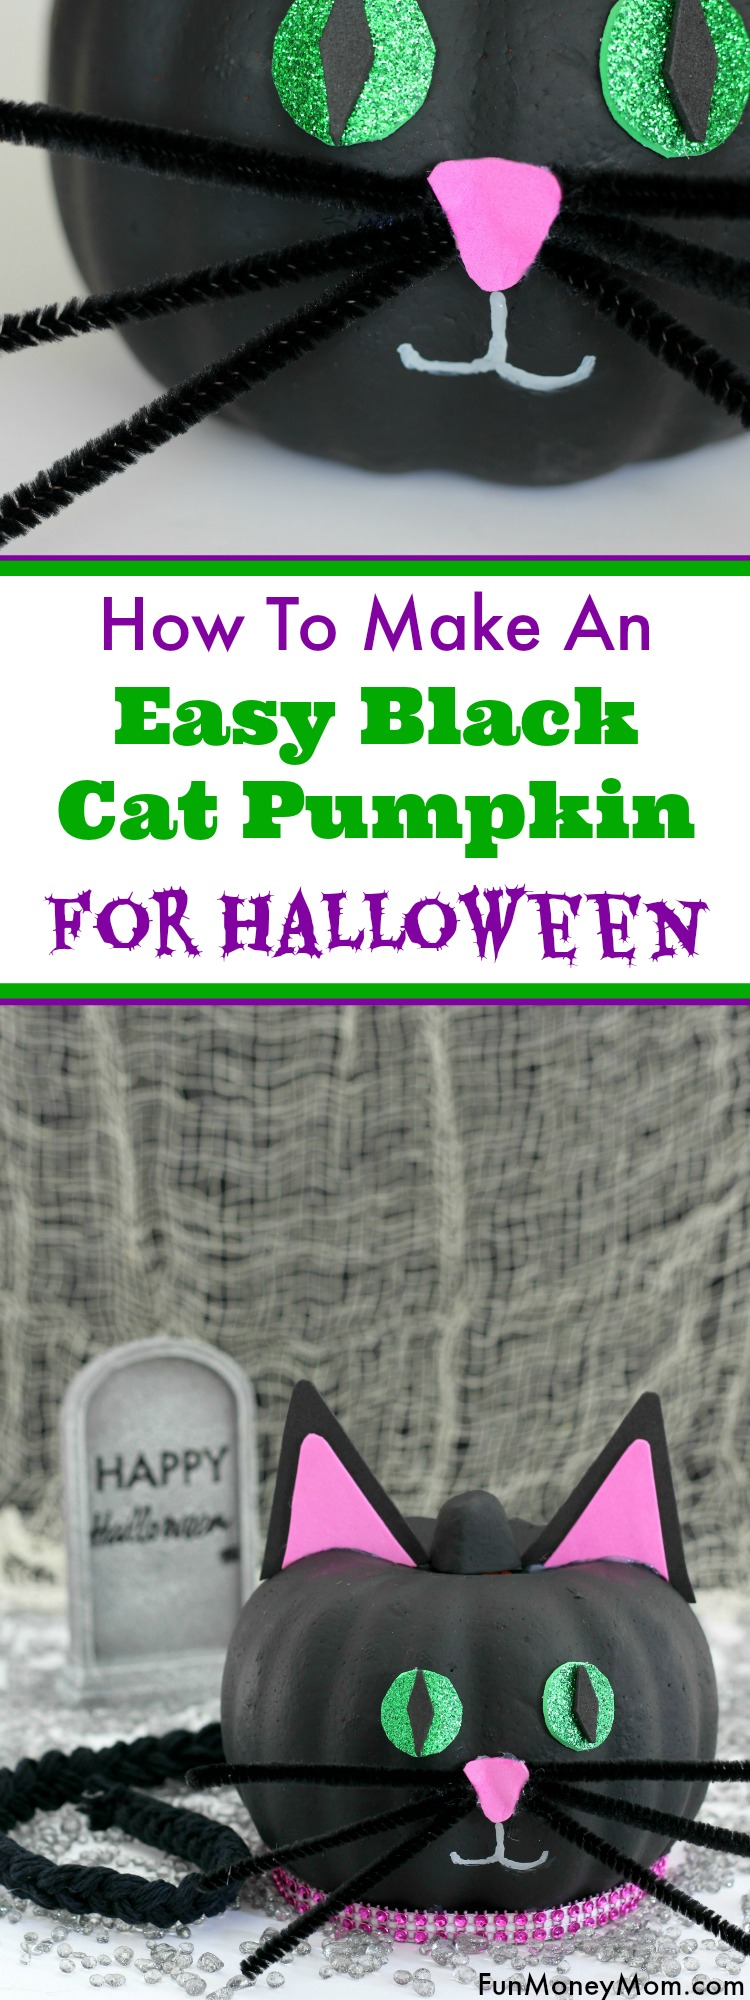 Love making no-carve pumpkins? Have a little Halloween fun making this easy black cat pumpkin!